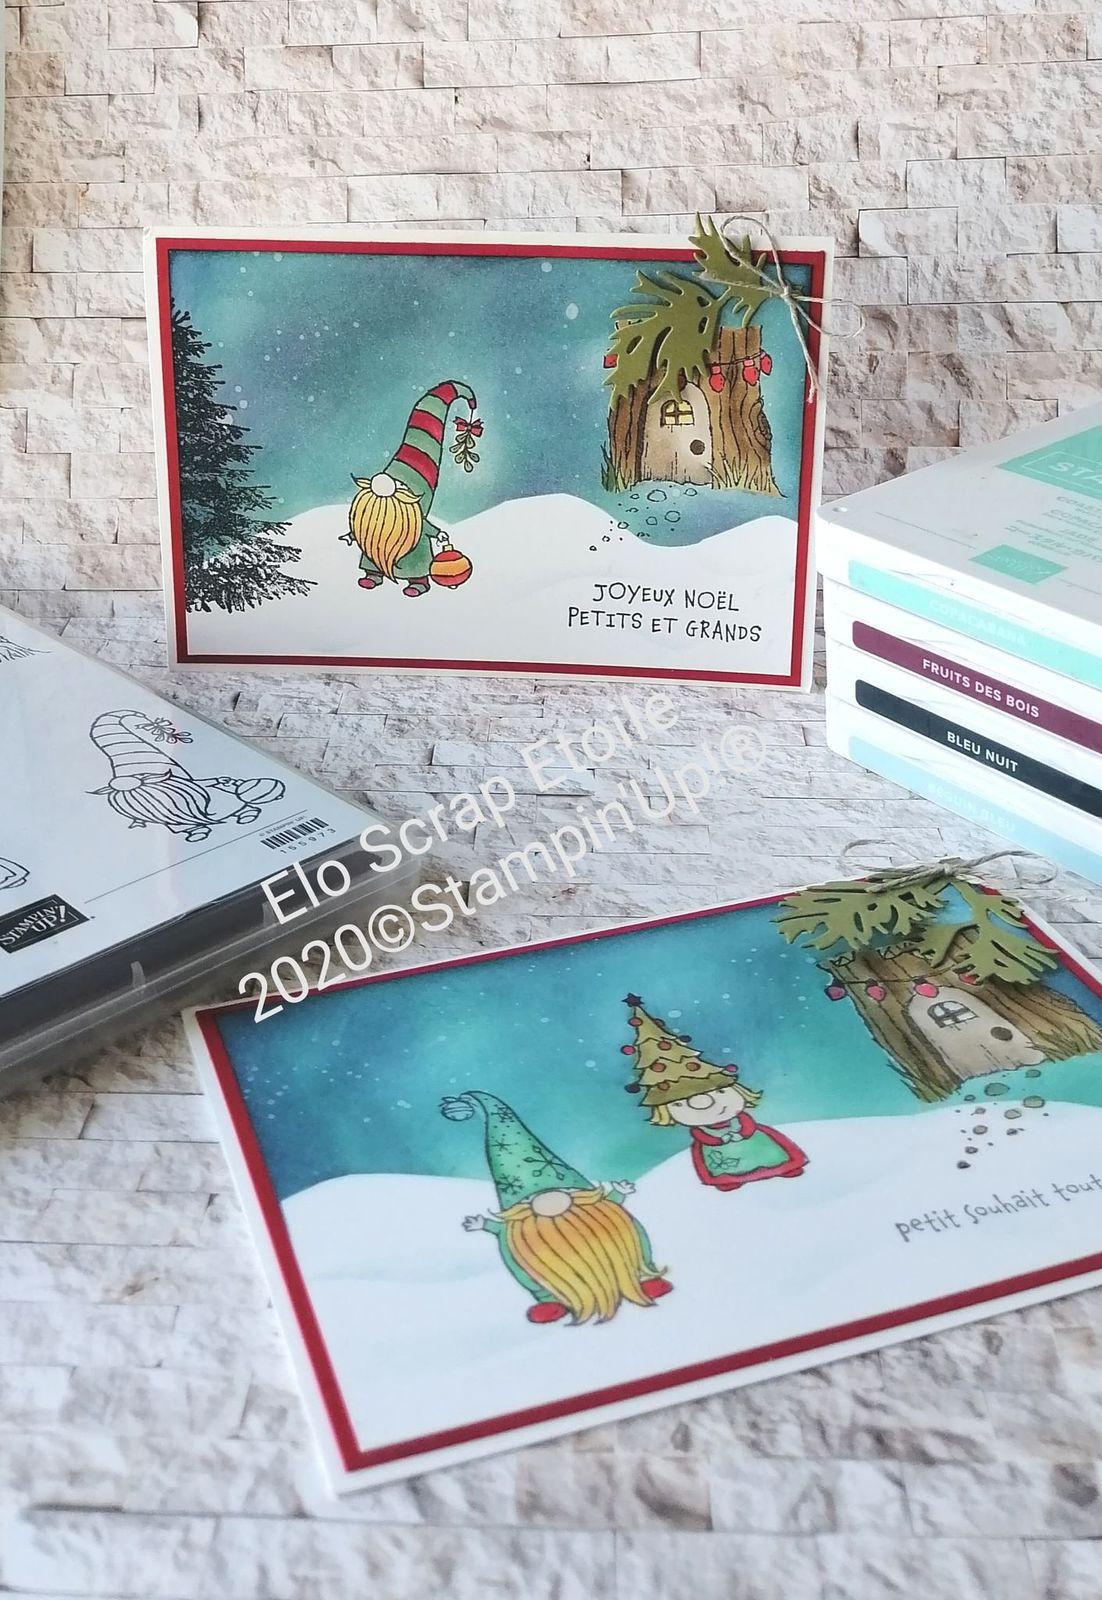 Noël chez les Gnomes Stampin'Up!